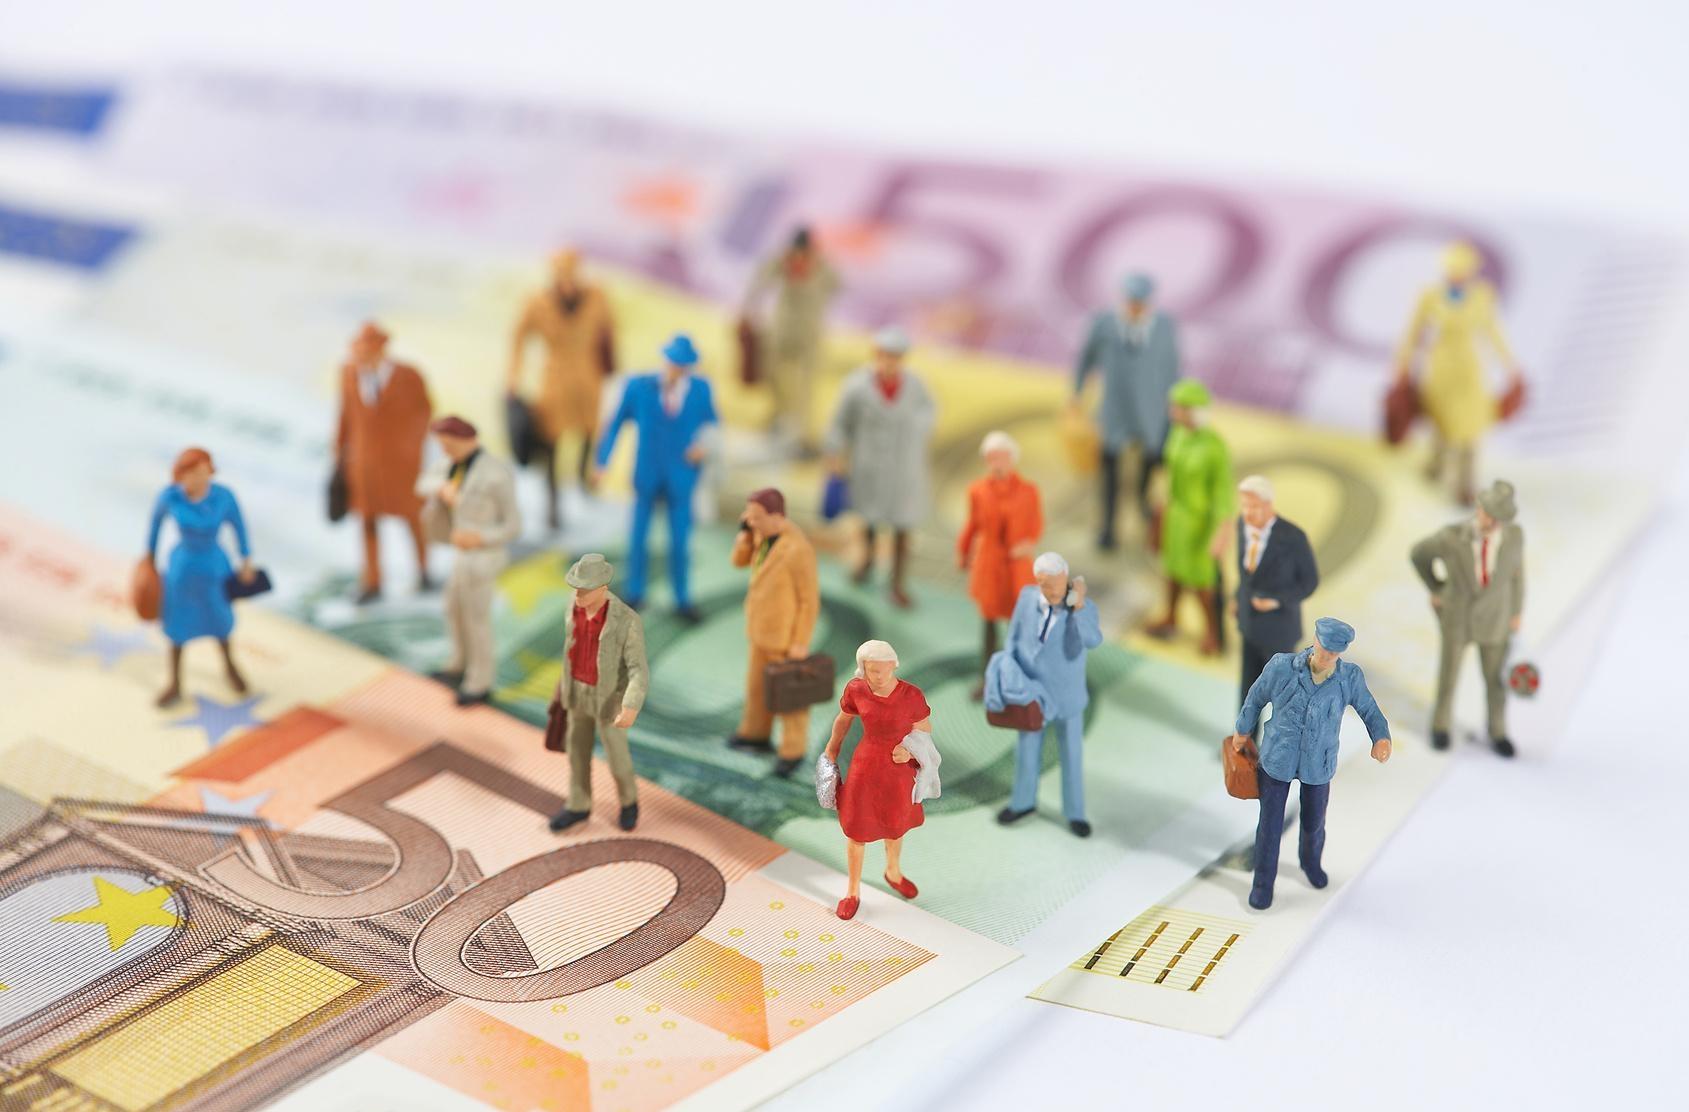 Картинки по макроэкономики